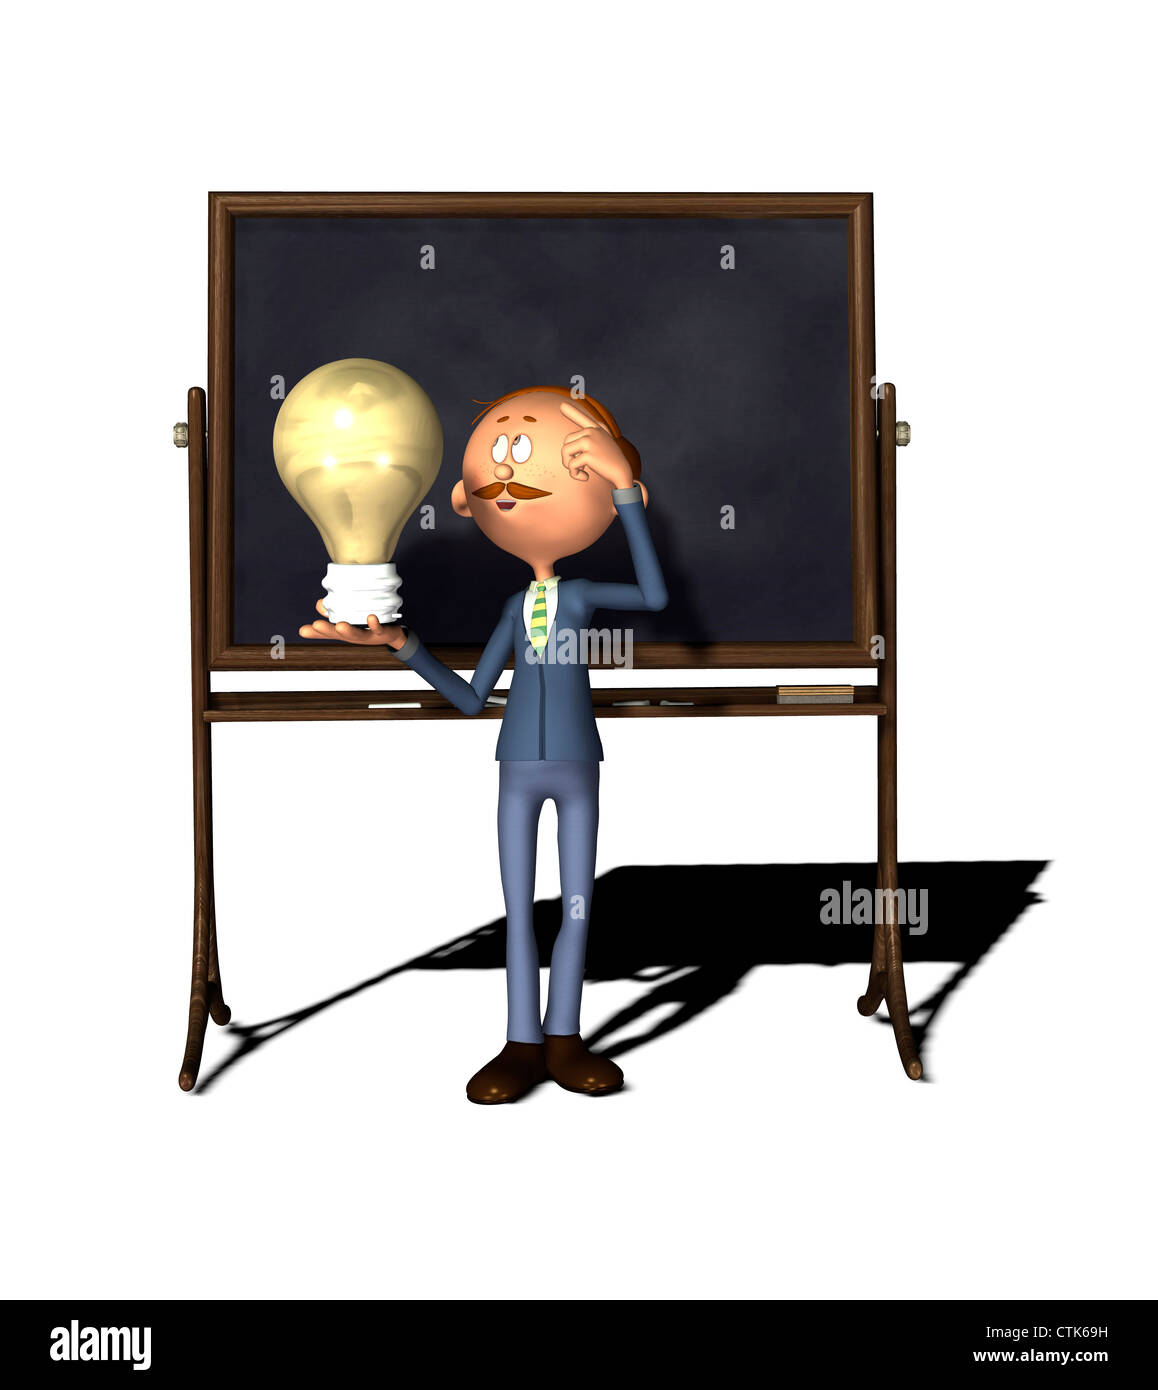 cartoon figure teacher with board and bulb Stock Photo